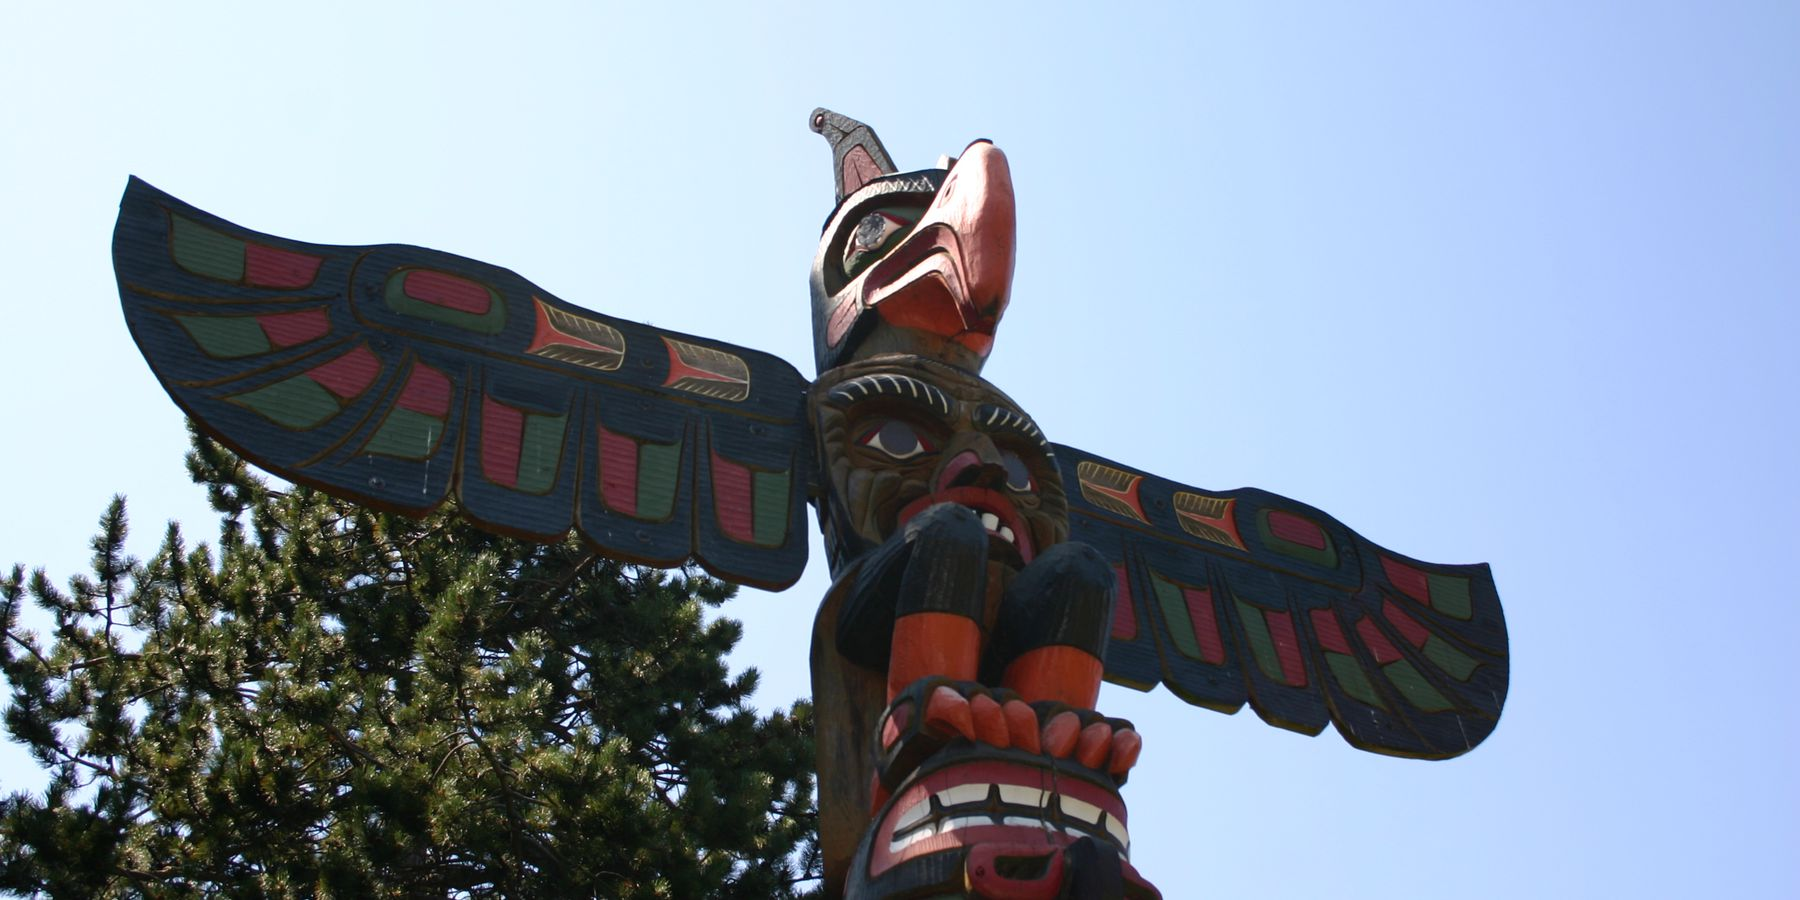 Royal BC Museum - Victoria - Vancouver Island - British Columbia - Canada - Doets Reizen